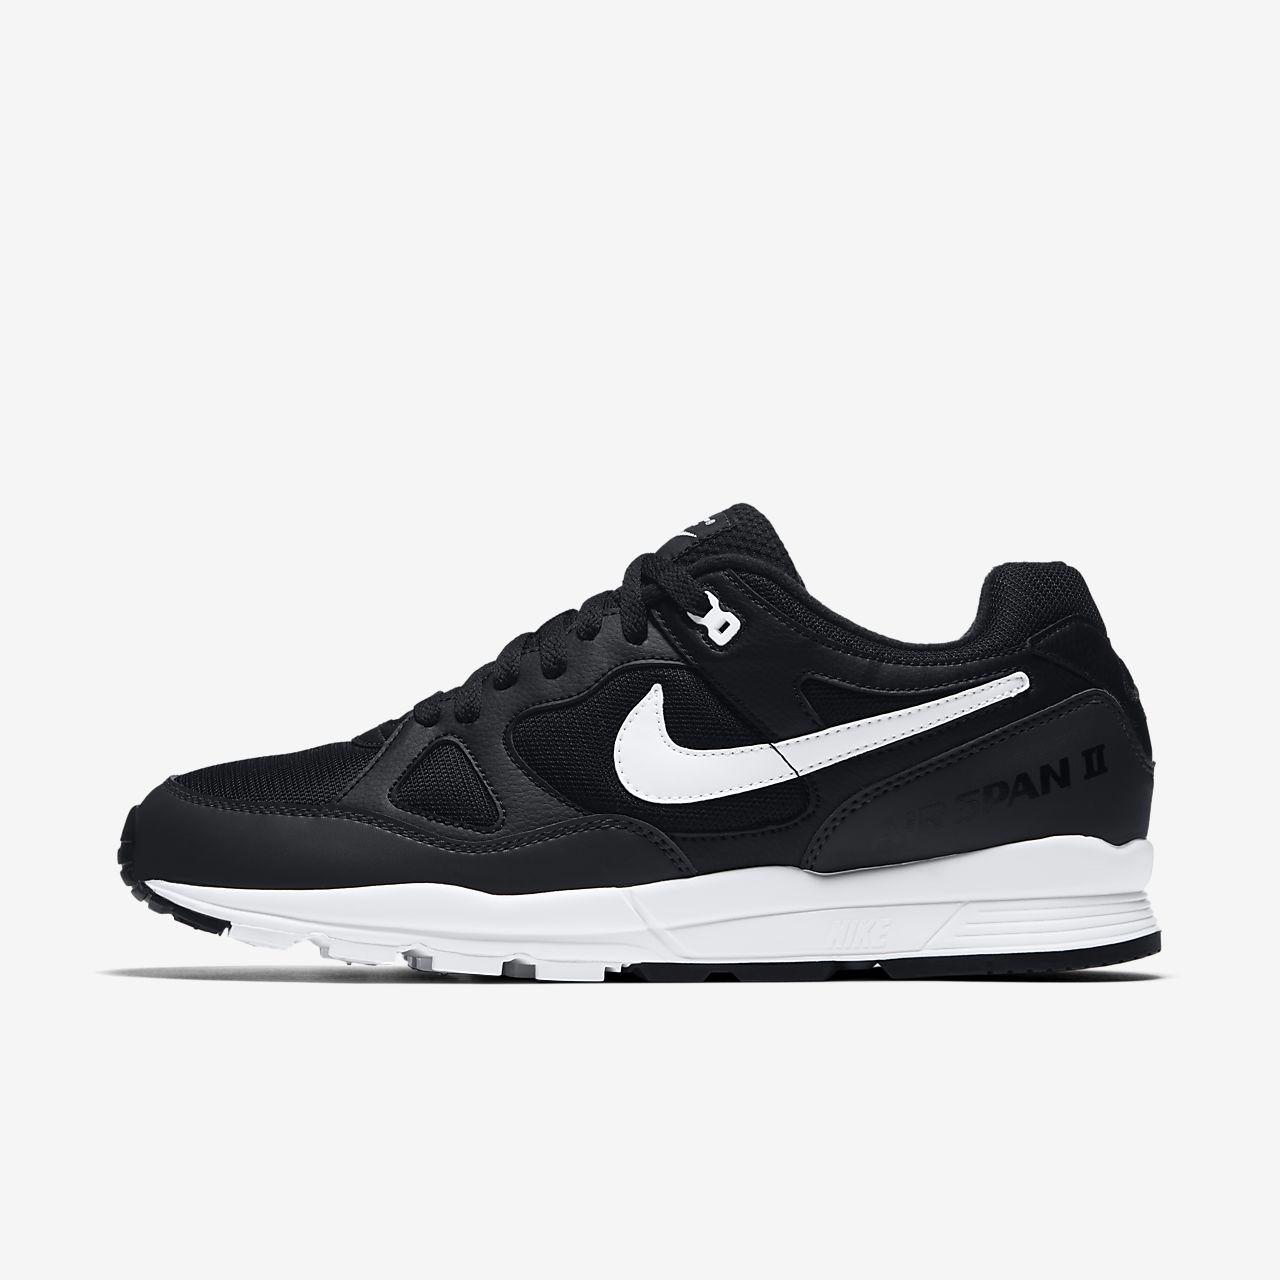 400fe73385bf Nike Air Span II Men s Shoe. Nike.com GB